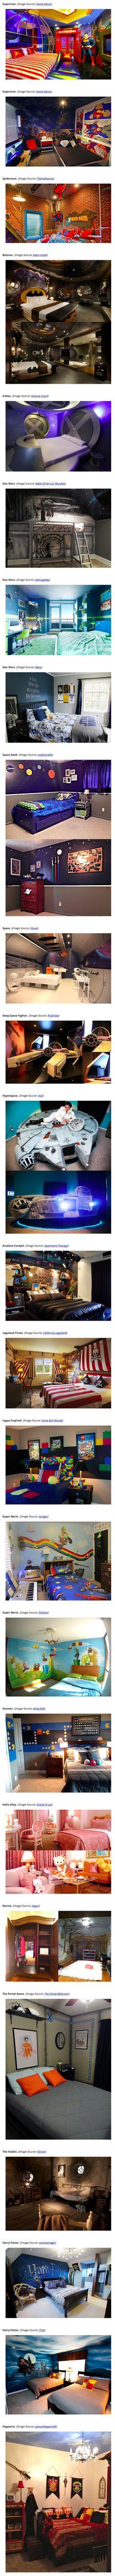 best fantasy bedroom images on pinterest in dream bedroom